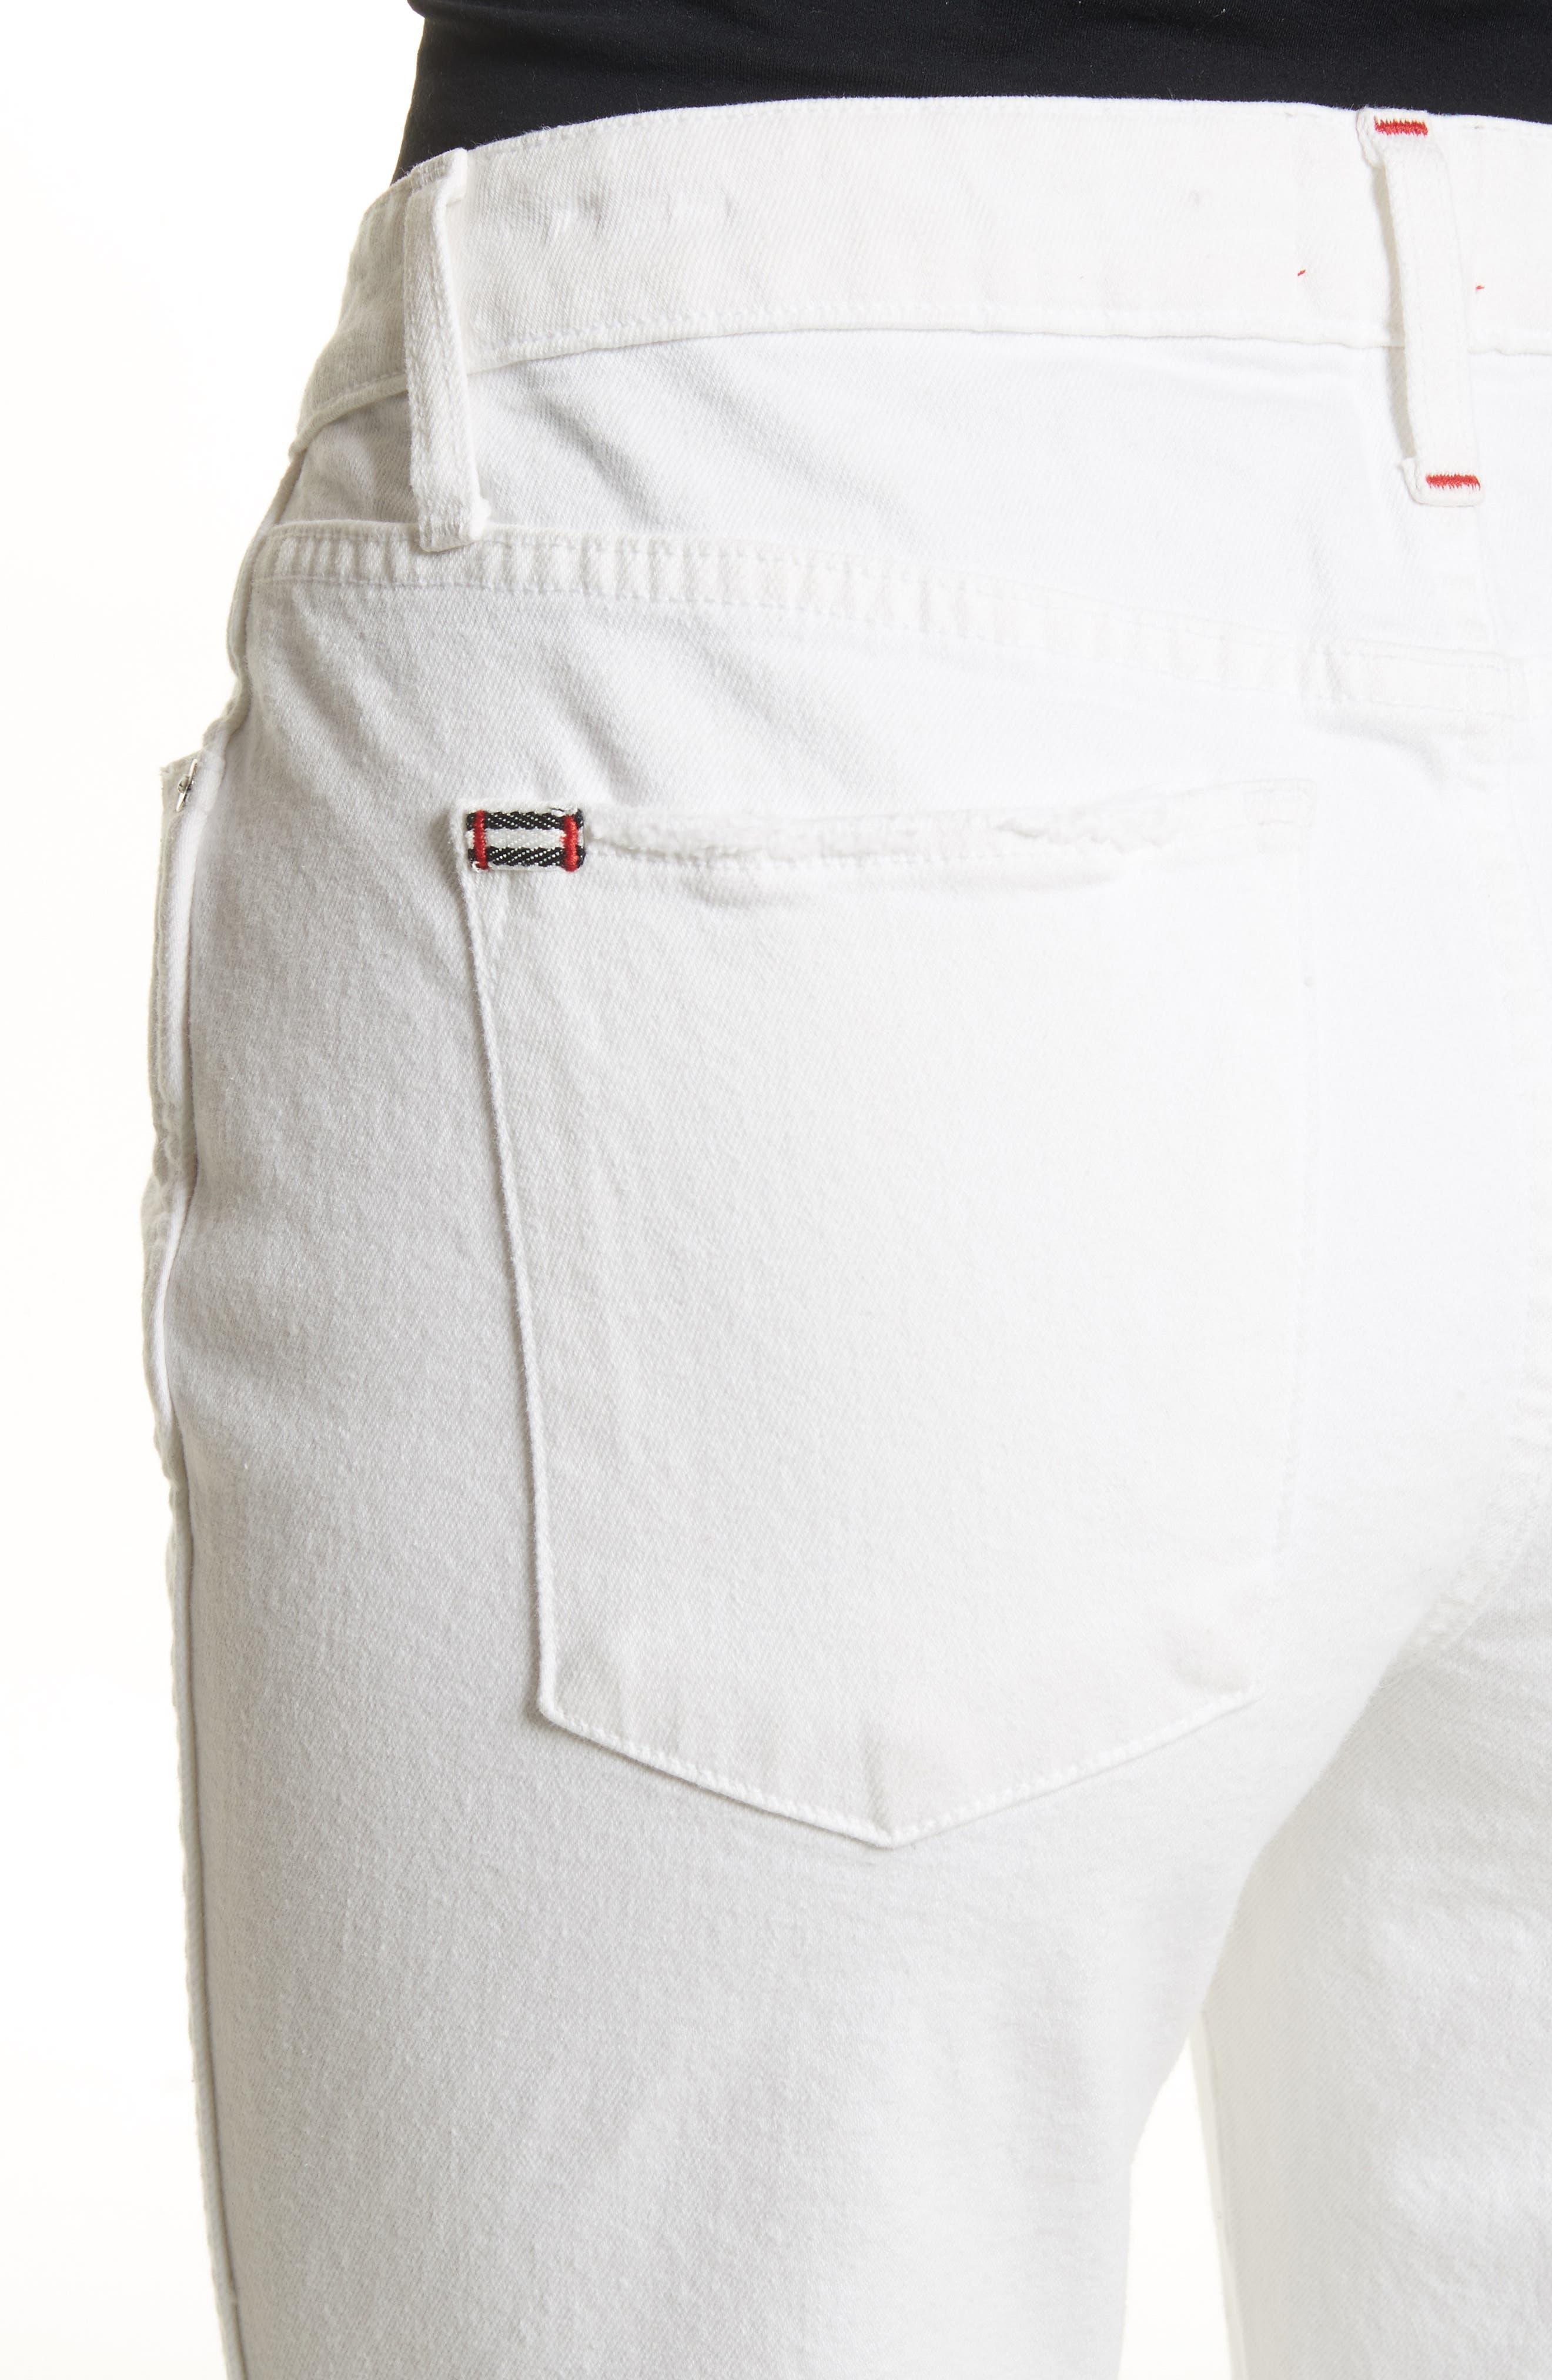 AO.LA Perfect Crop Kick Flare Jeans,                             Alternate thumbnail 4, color,                             160